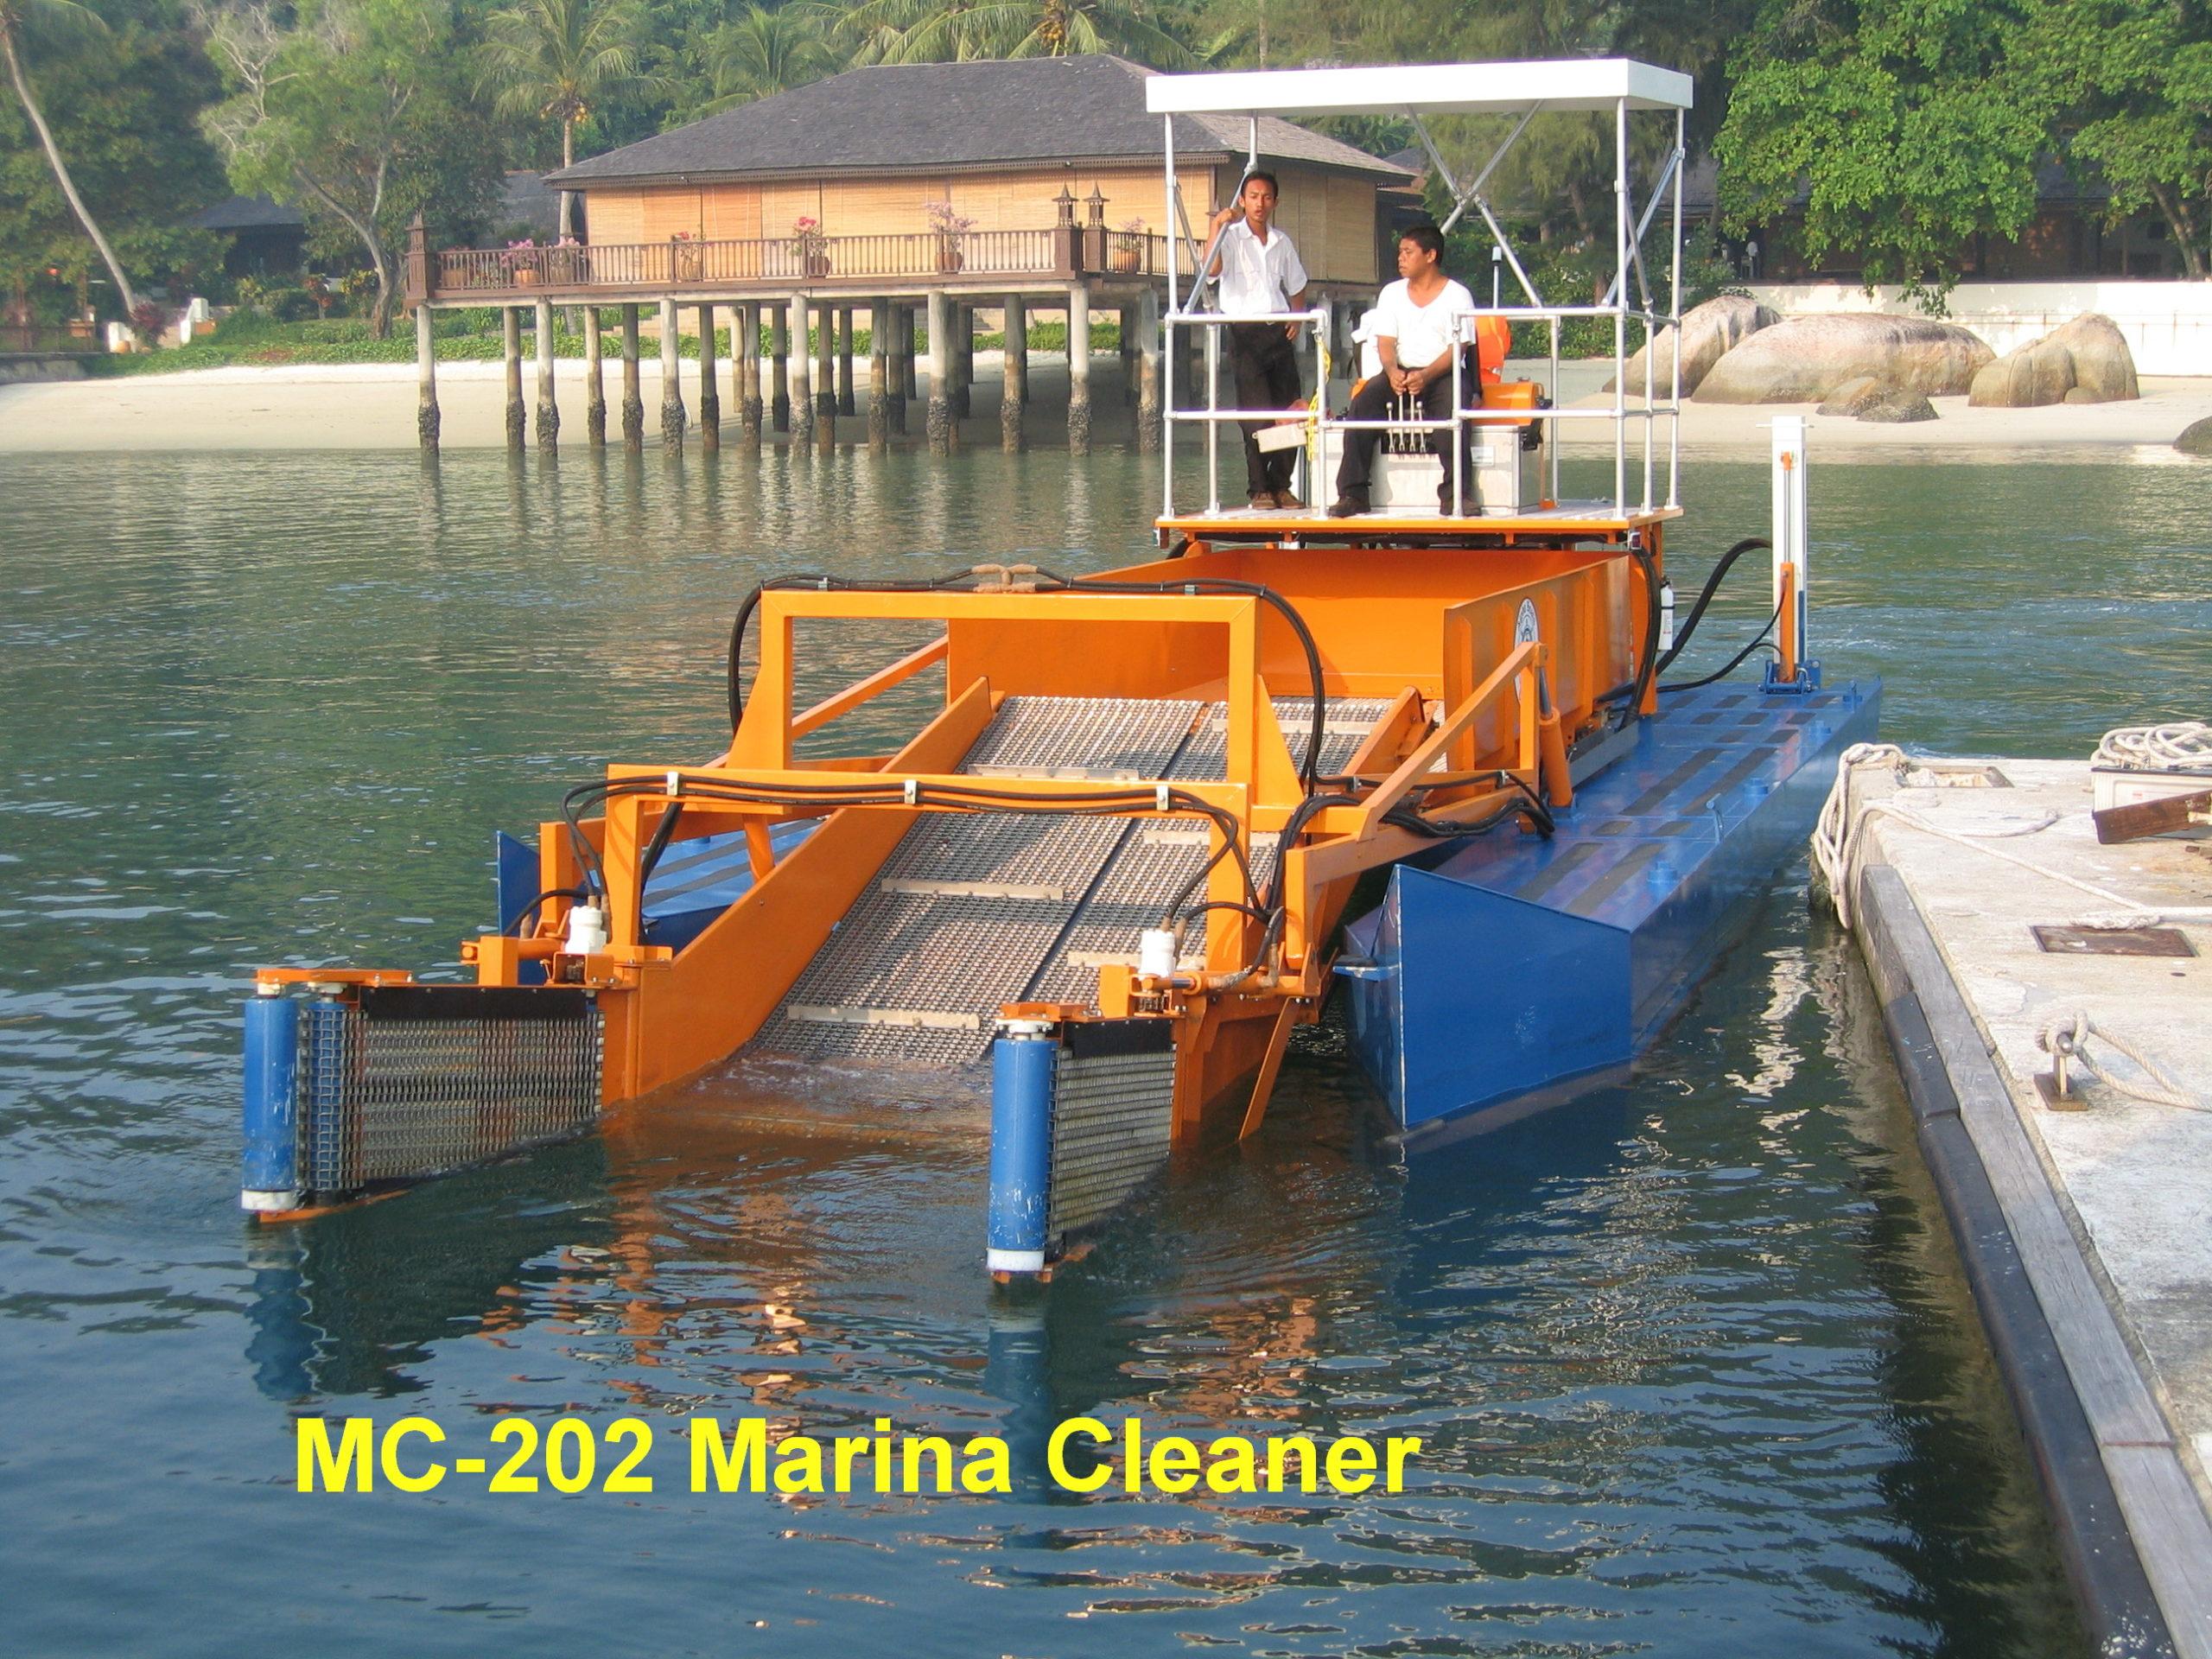 MC 202 Pontoon approaching dock